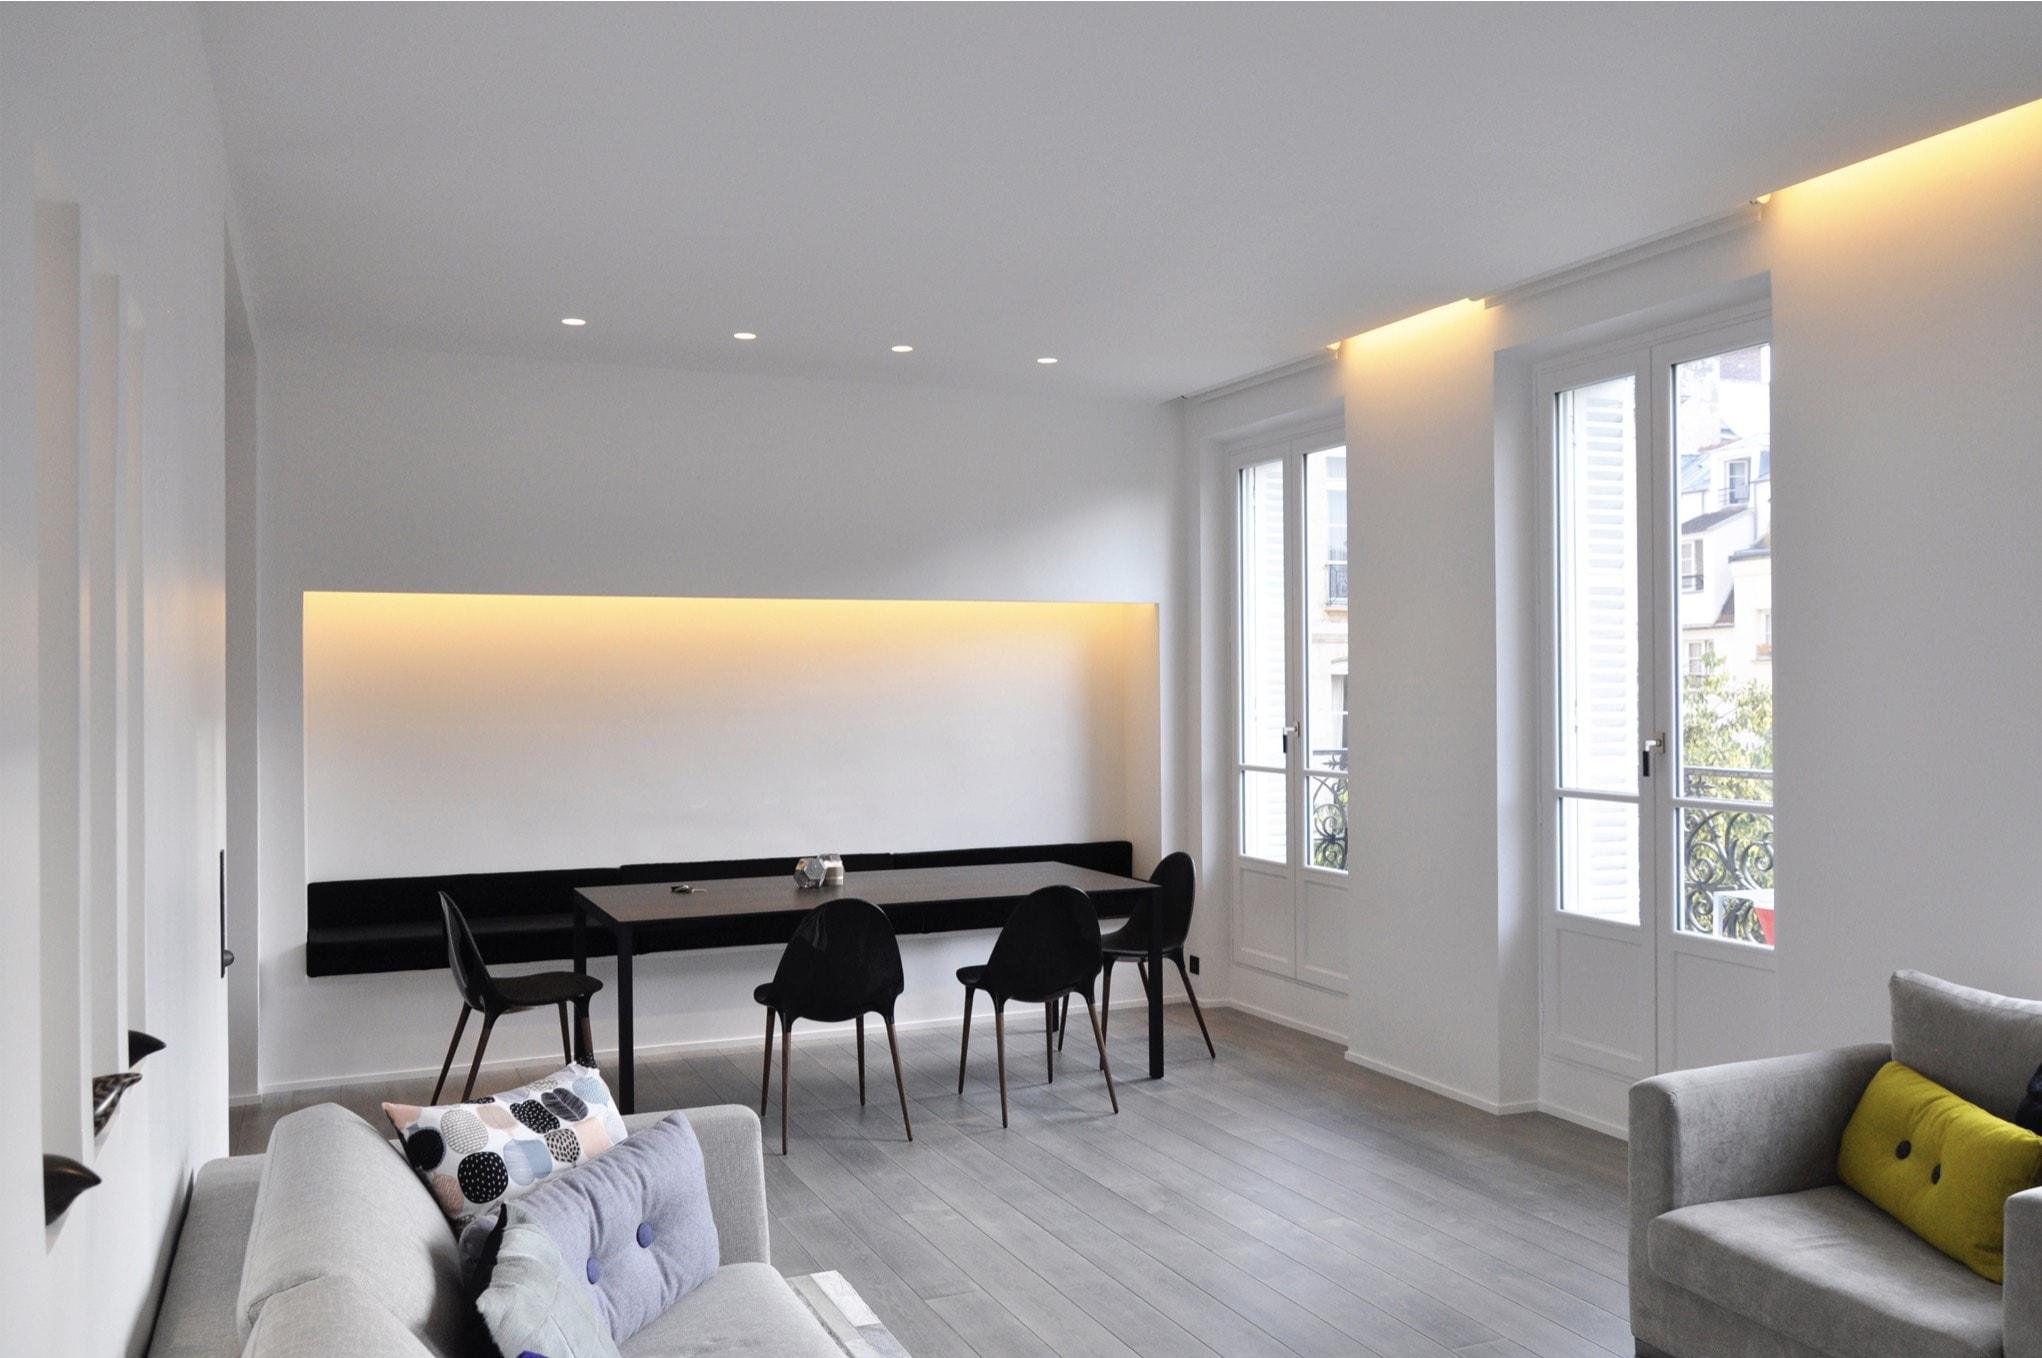 Appartement moderne, vue salon et salle à manger